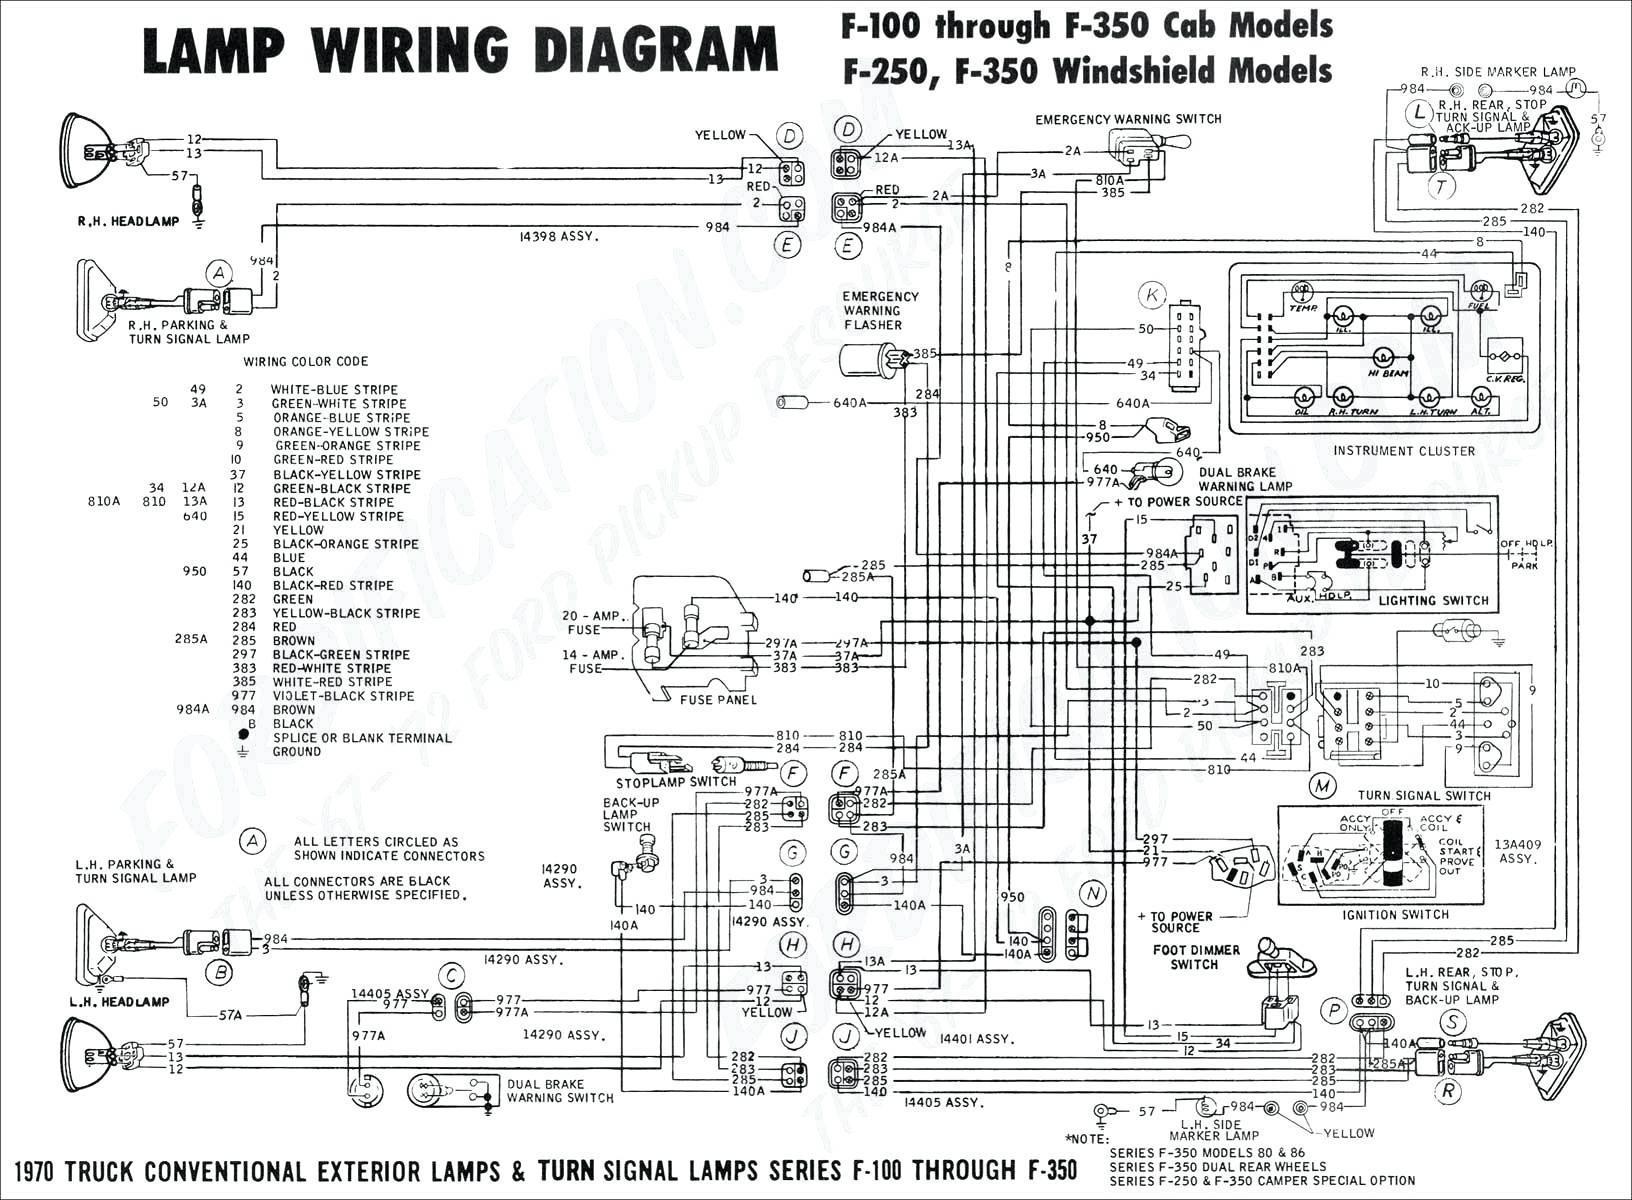 2001 Nissan Maxima Engine Diagram 2000 Nissan Maxima Fuse Diagram Of 2001 Nissan Maxima Engine Diagram